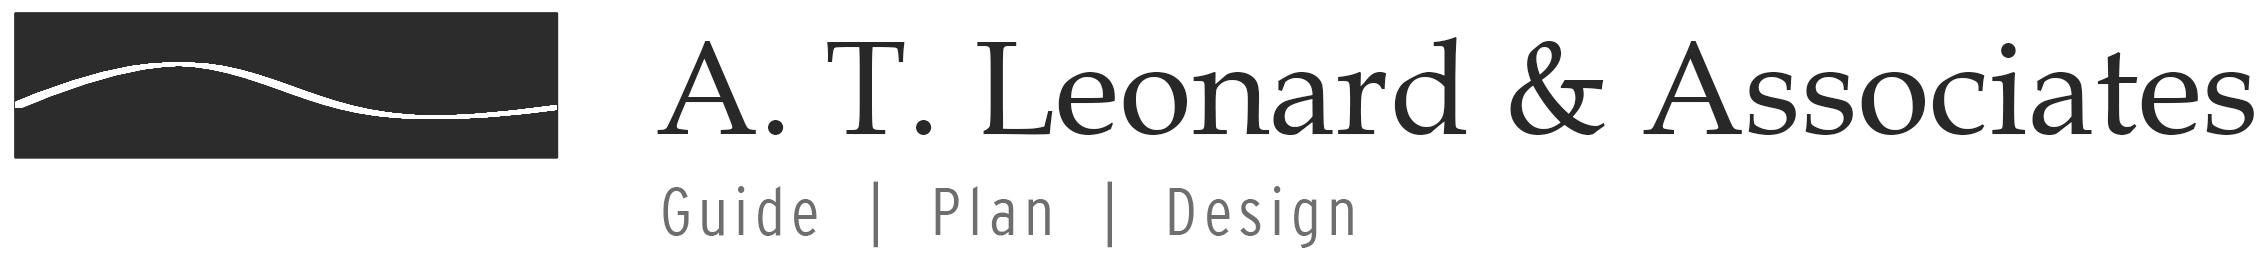 A. T. Leonard & Associates